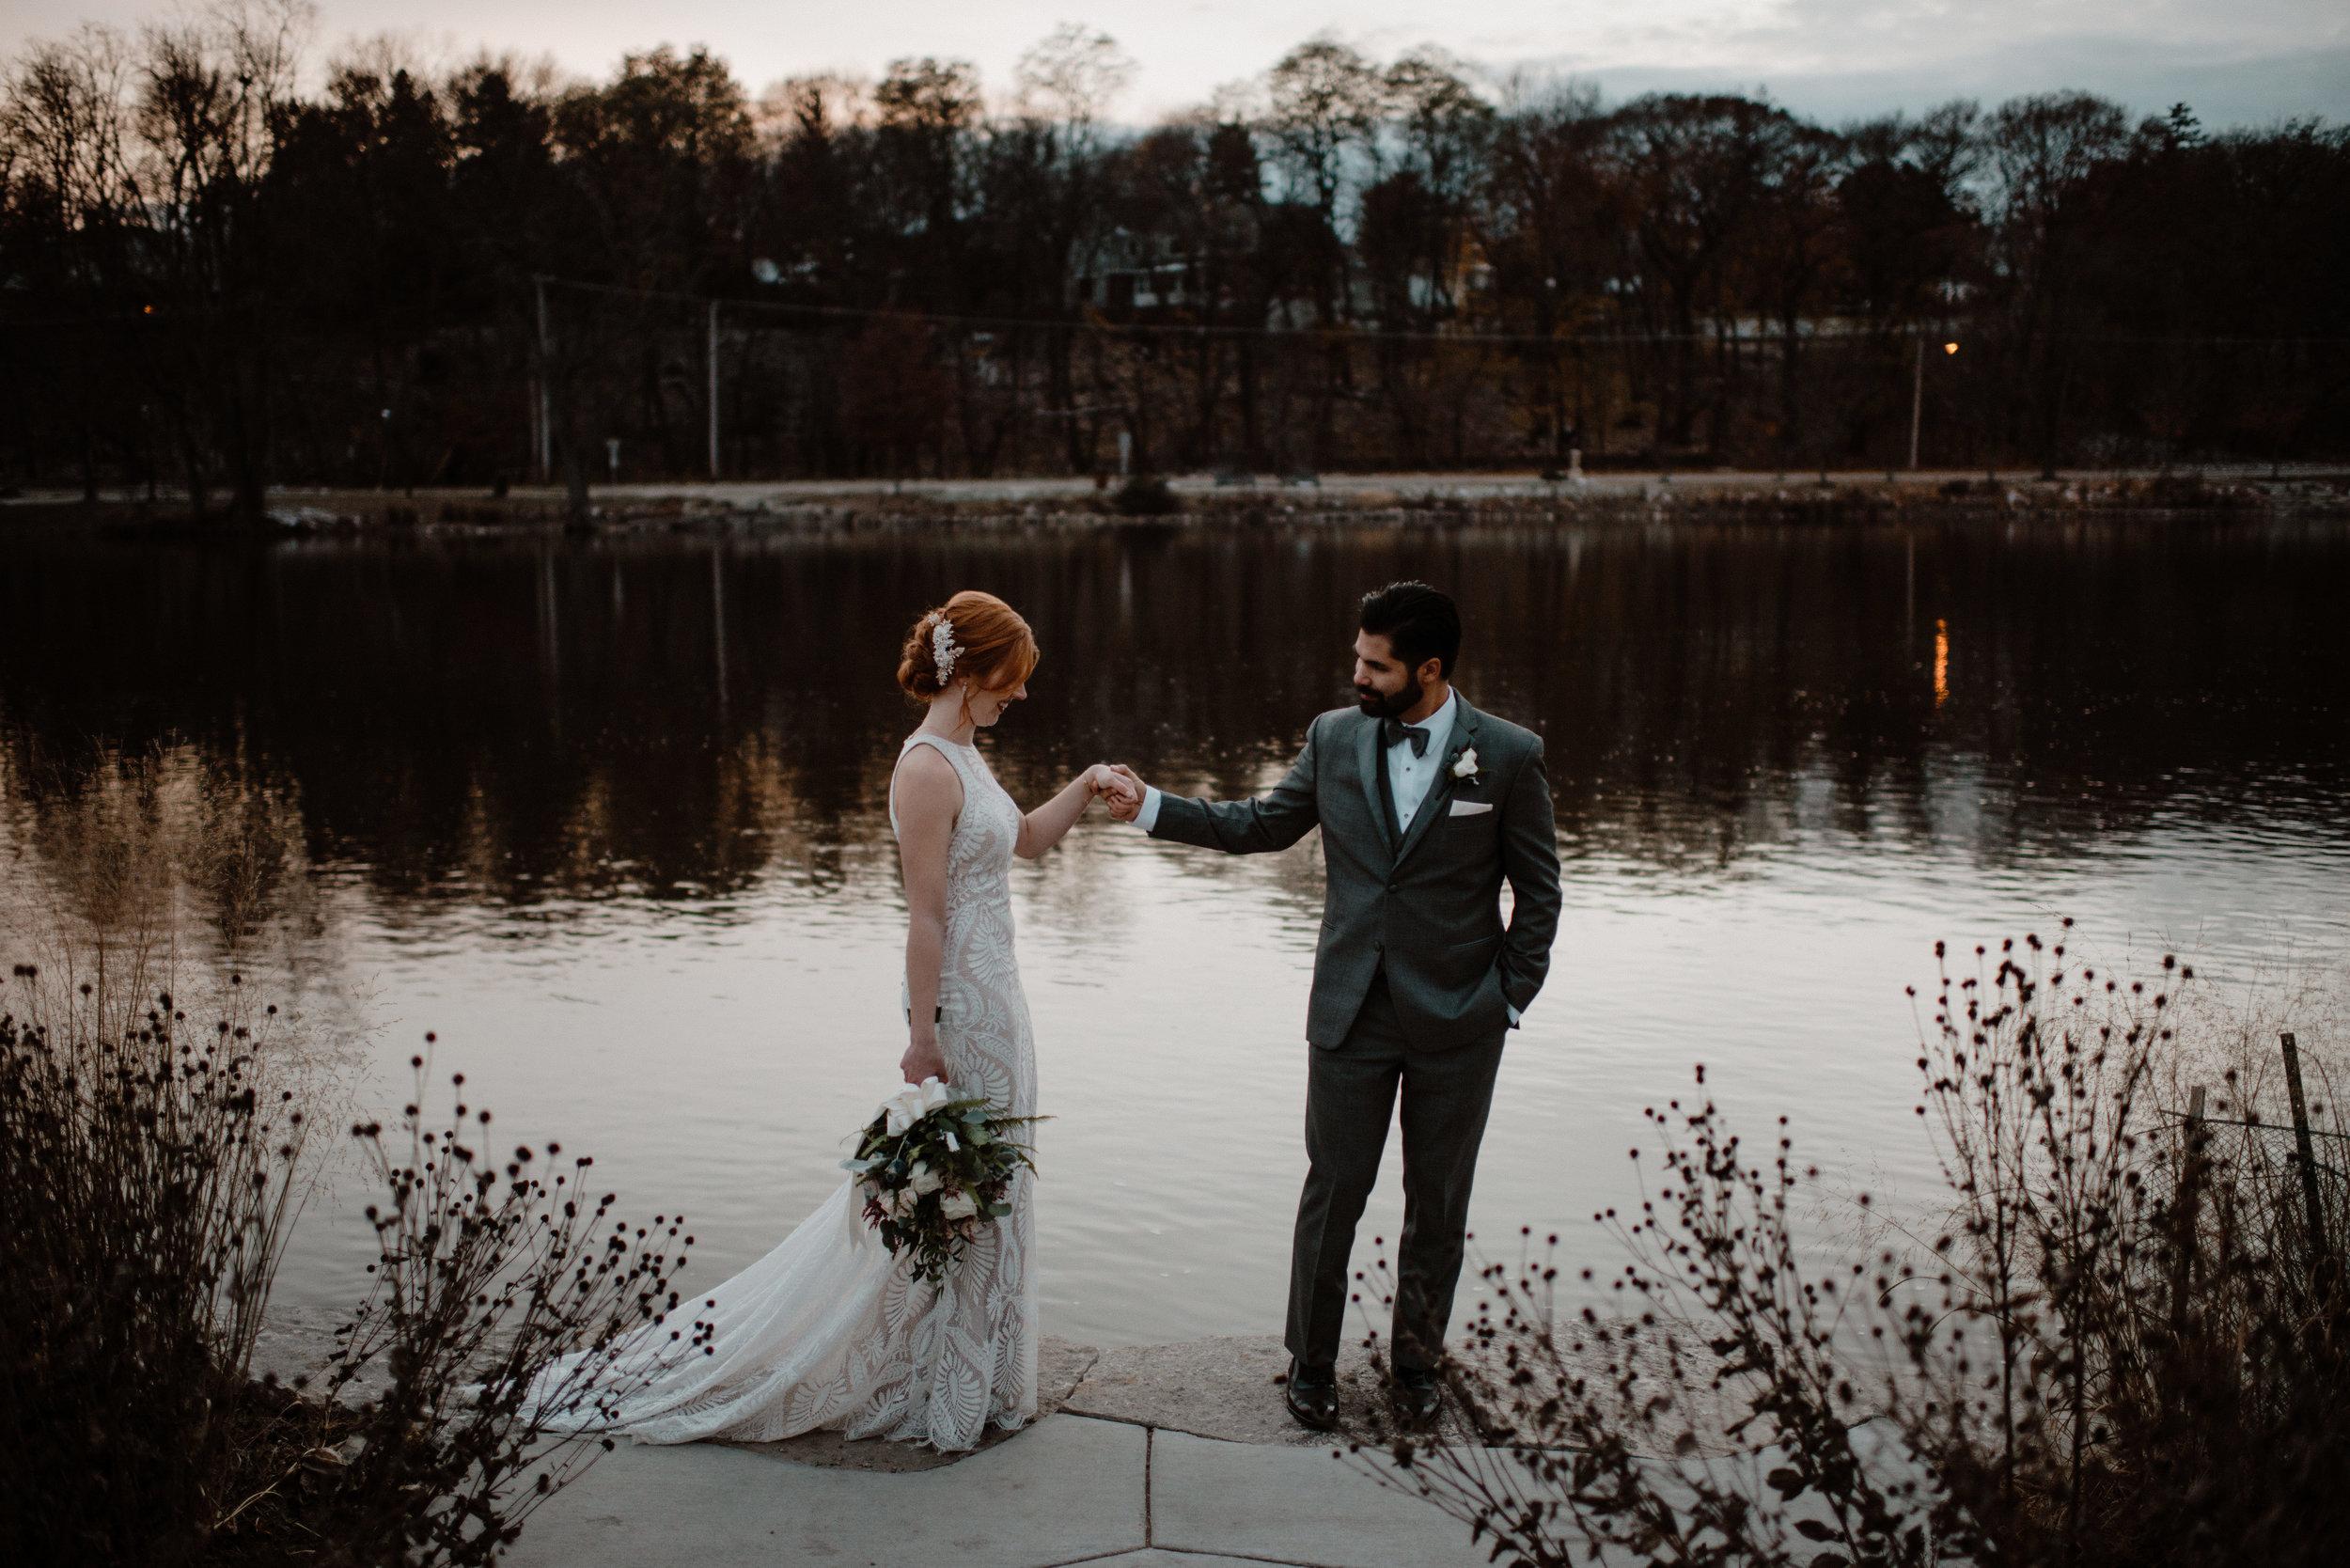 The Brix on Fox, Chicago Wedding Photographer, Zach and Rosalie00062.jpg